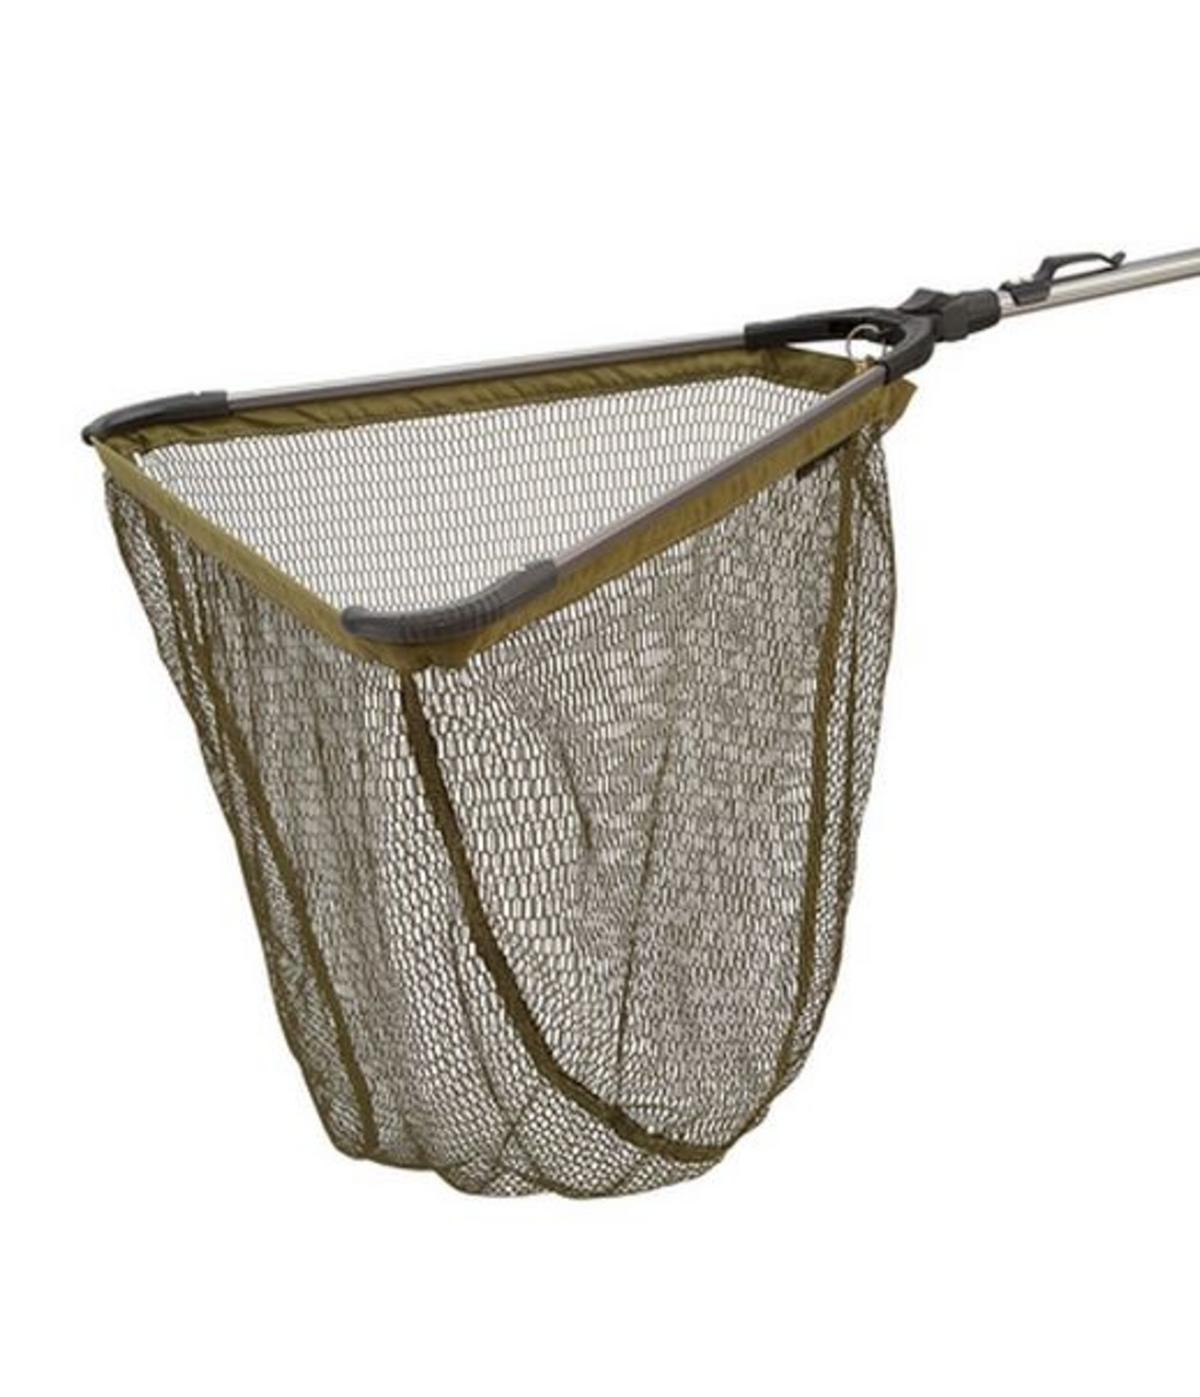 New Daiwa Trout Fishing Folding Telescopic Landing Net 60CM - DTN4